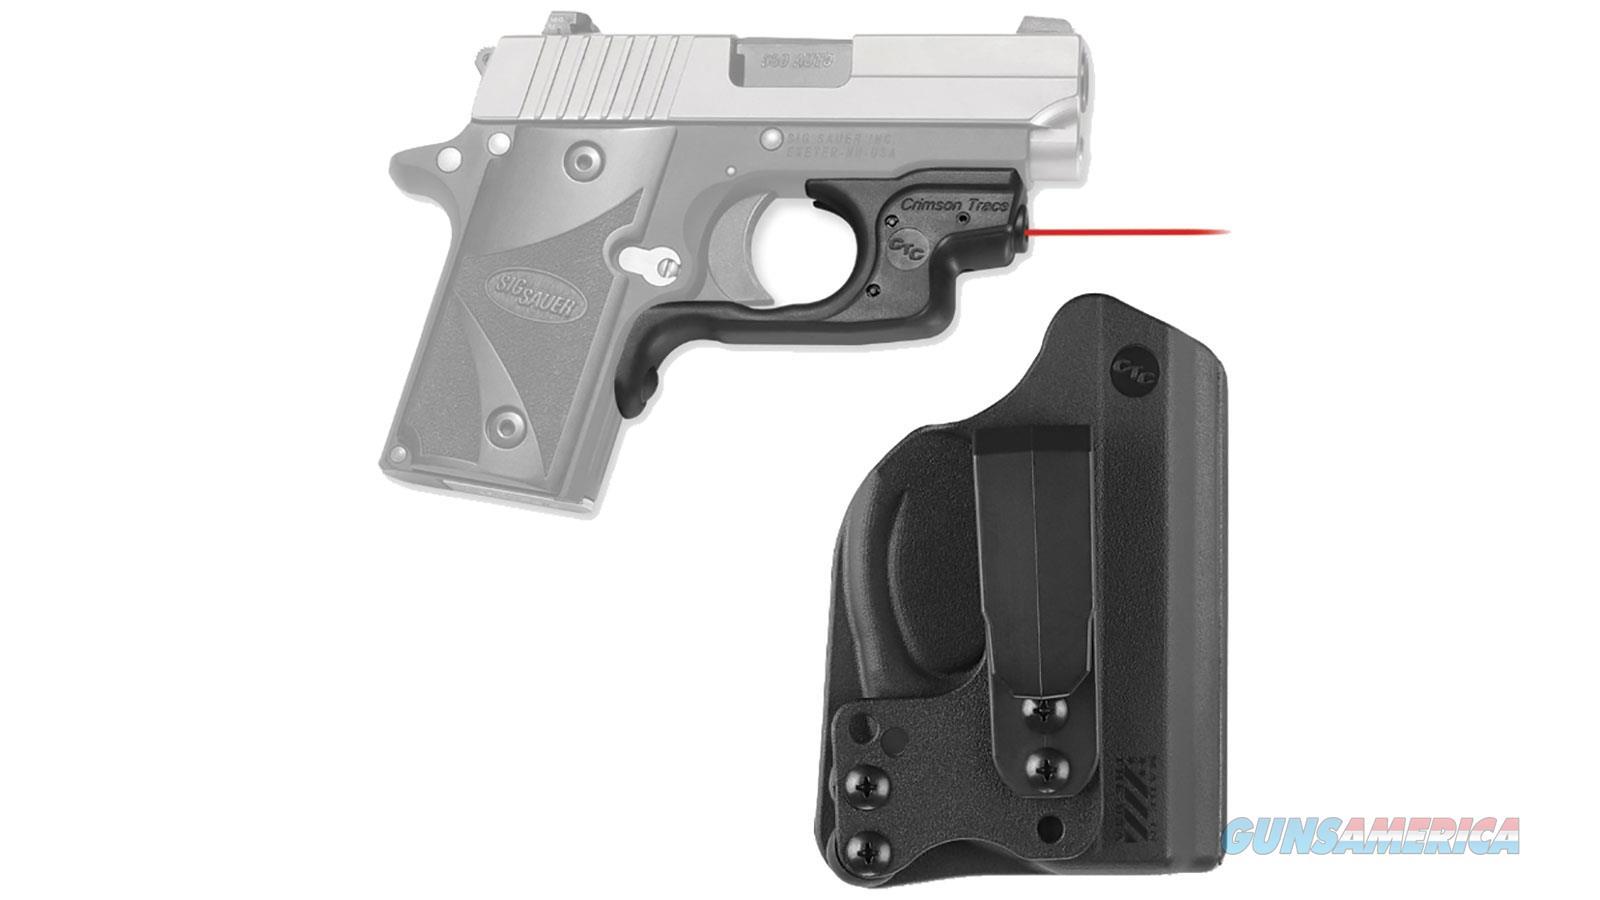 Crimson Trace Laserguard Sig P238/P938 LG-492-HBT  Non-Guns > Iron/Metal/Peep Sights